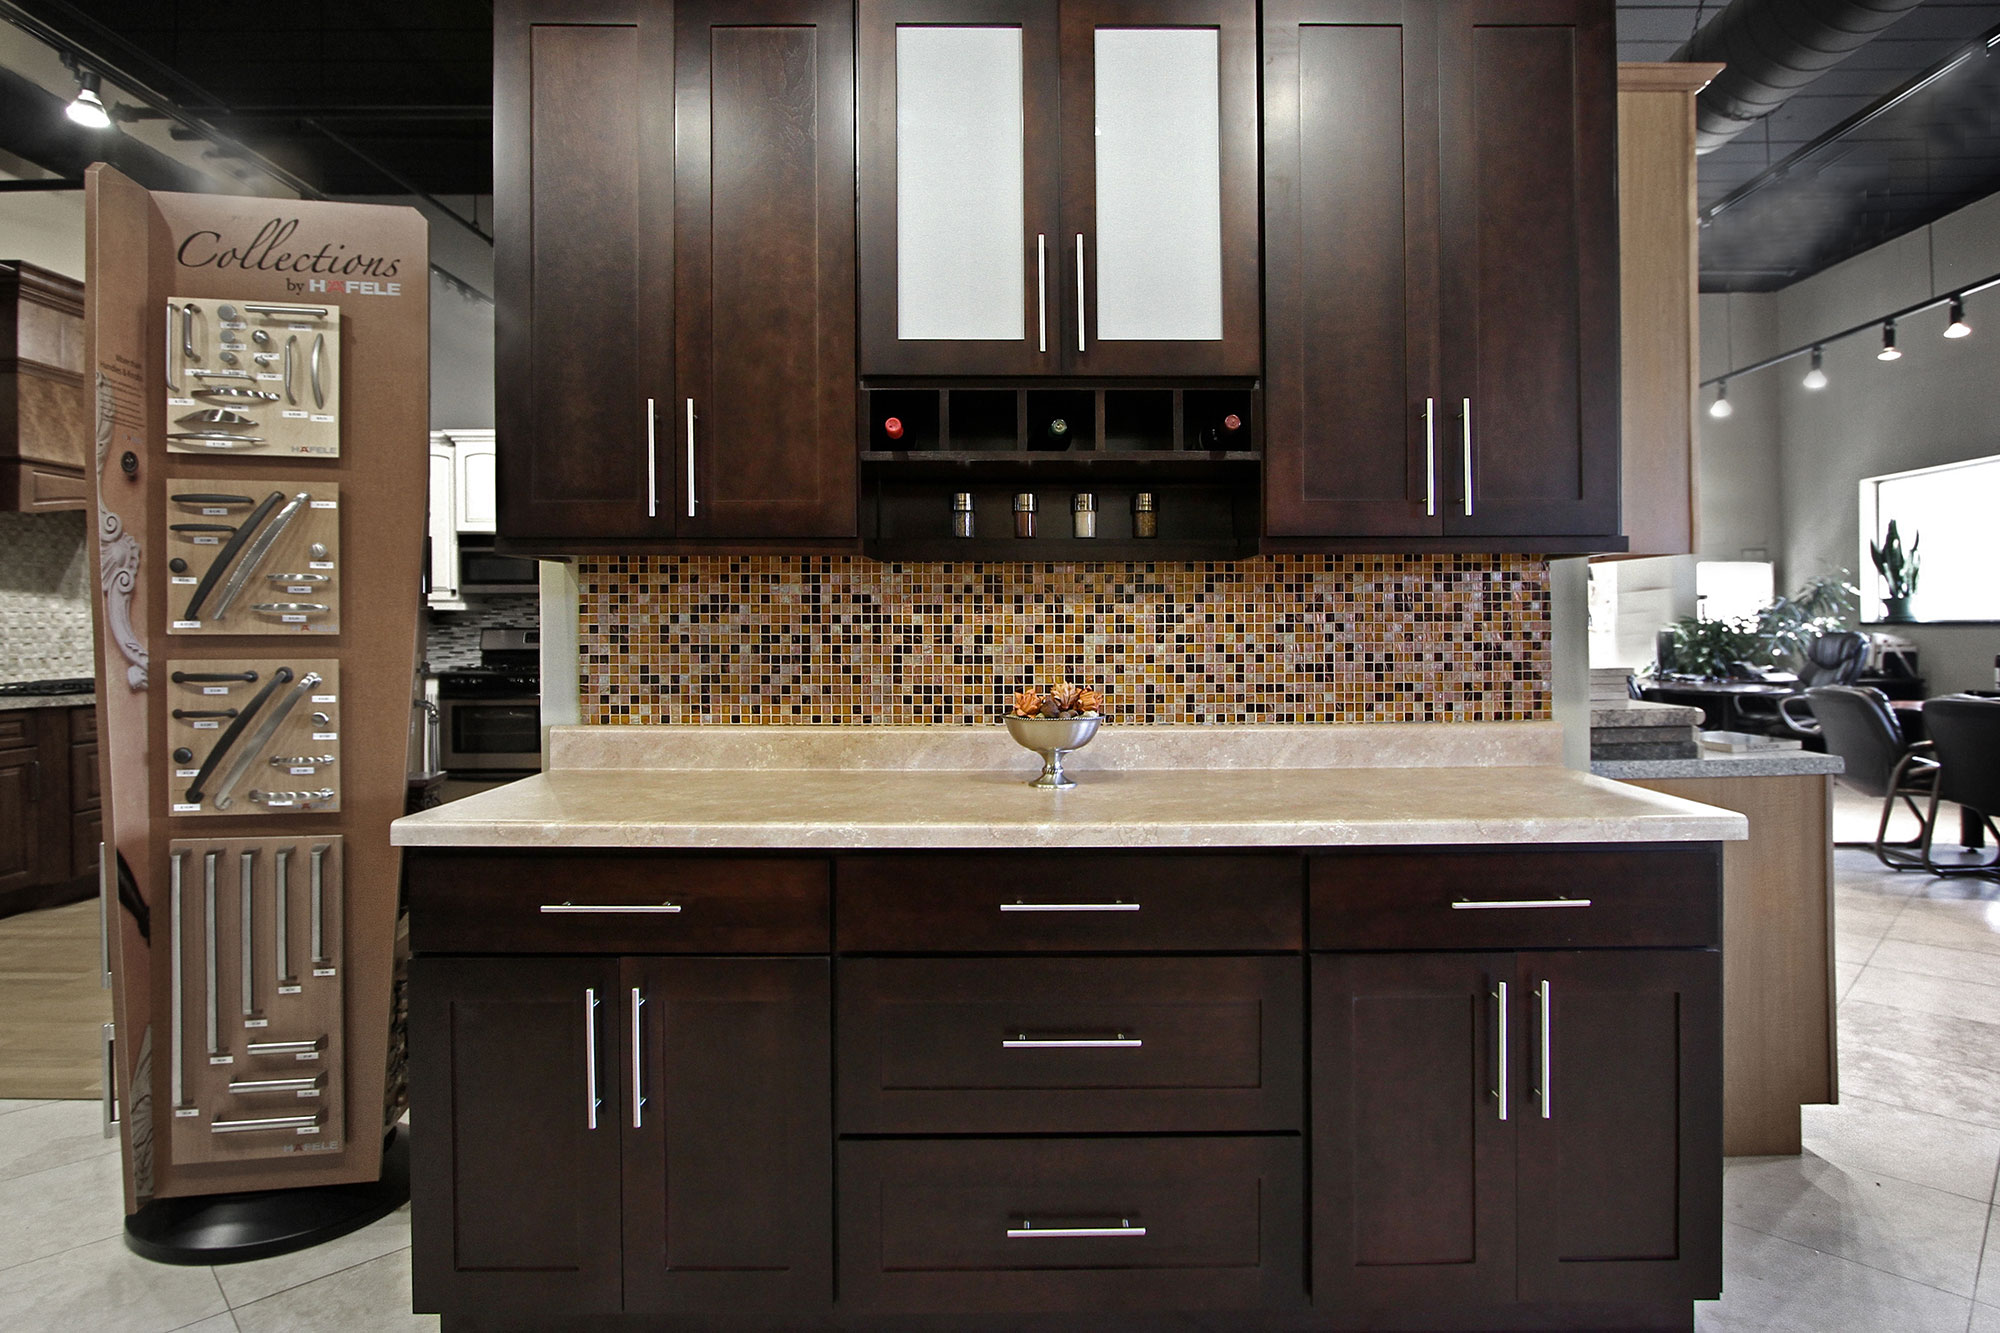 instock kitchen cabinets eat in tables shaker bath bathroom kichen stock